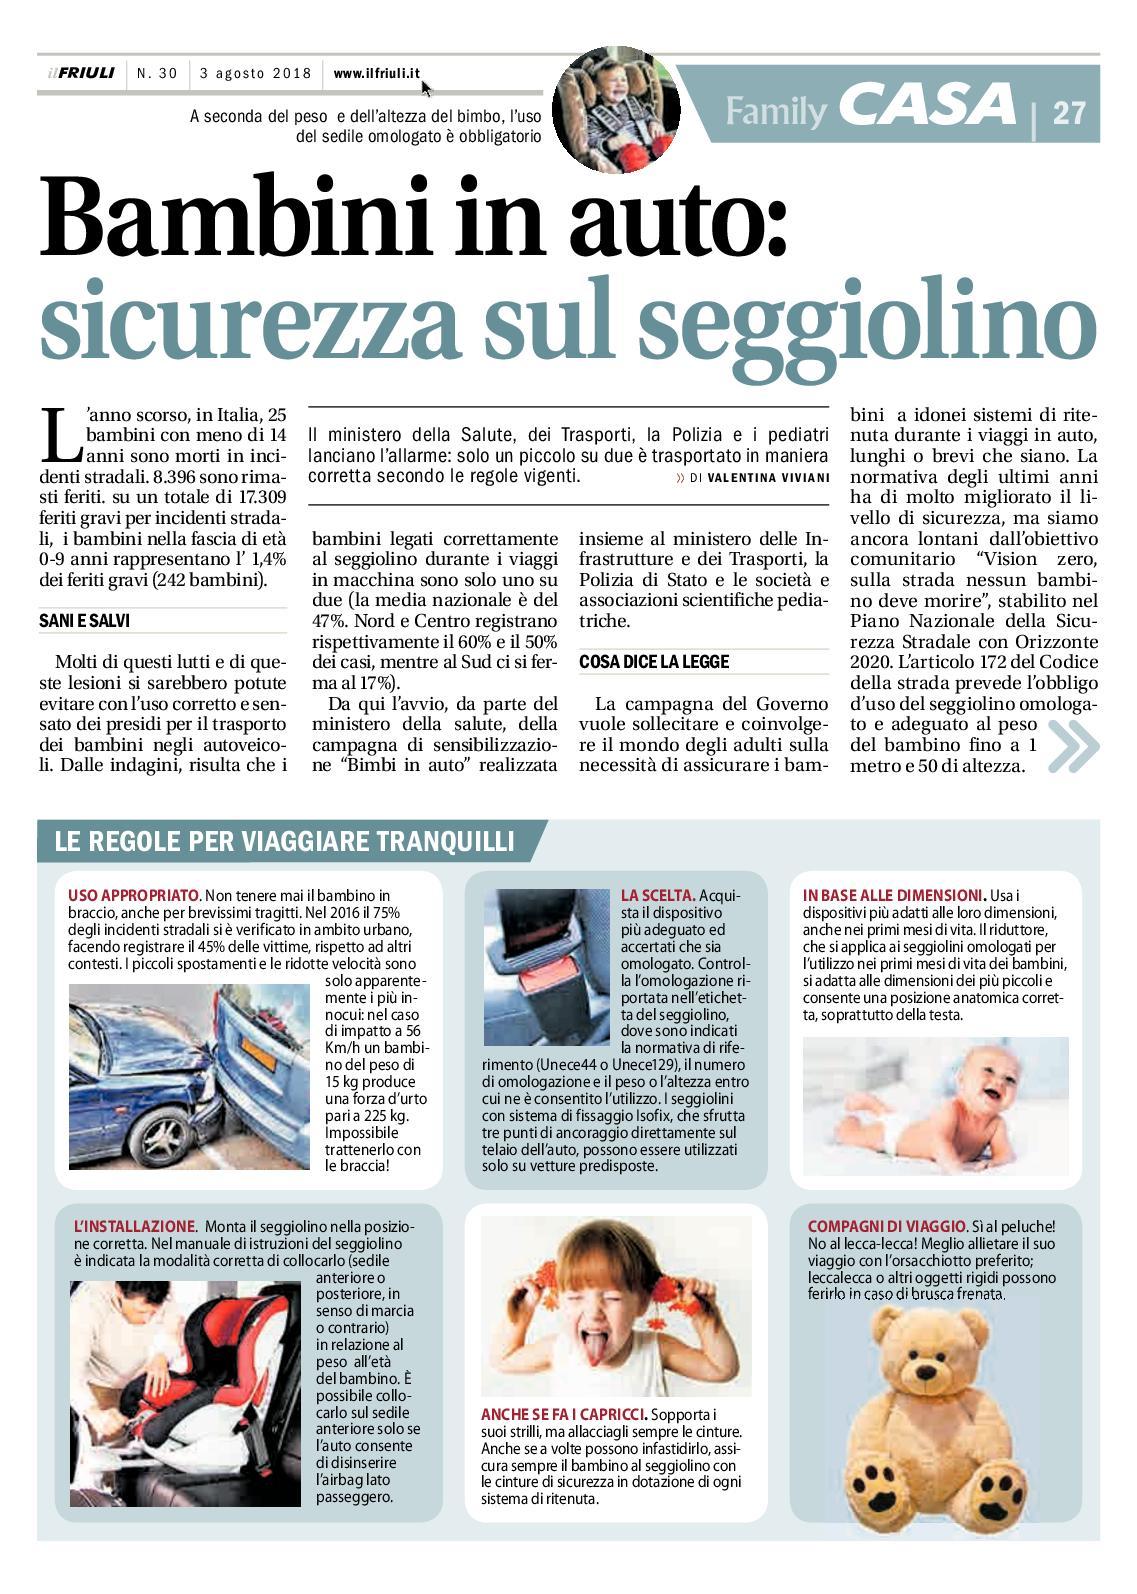 Casa Del Sedile Snc.Il Friuli N30 03082018 Calameo Downloader